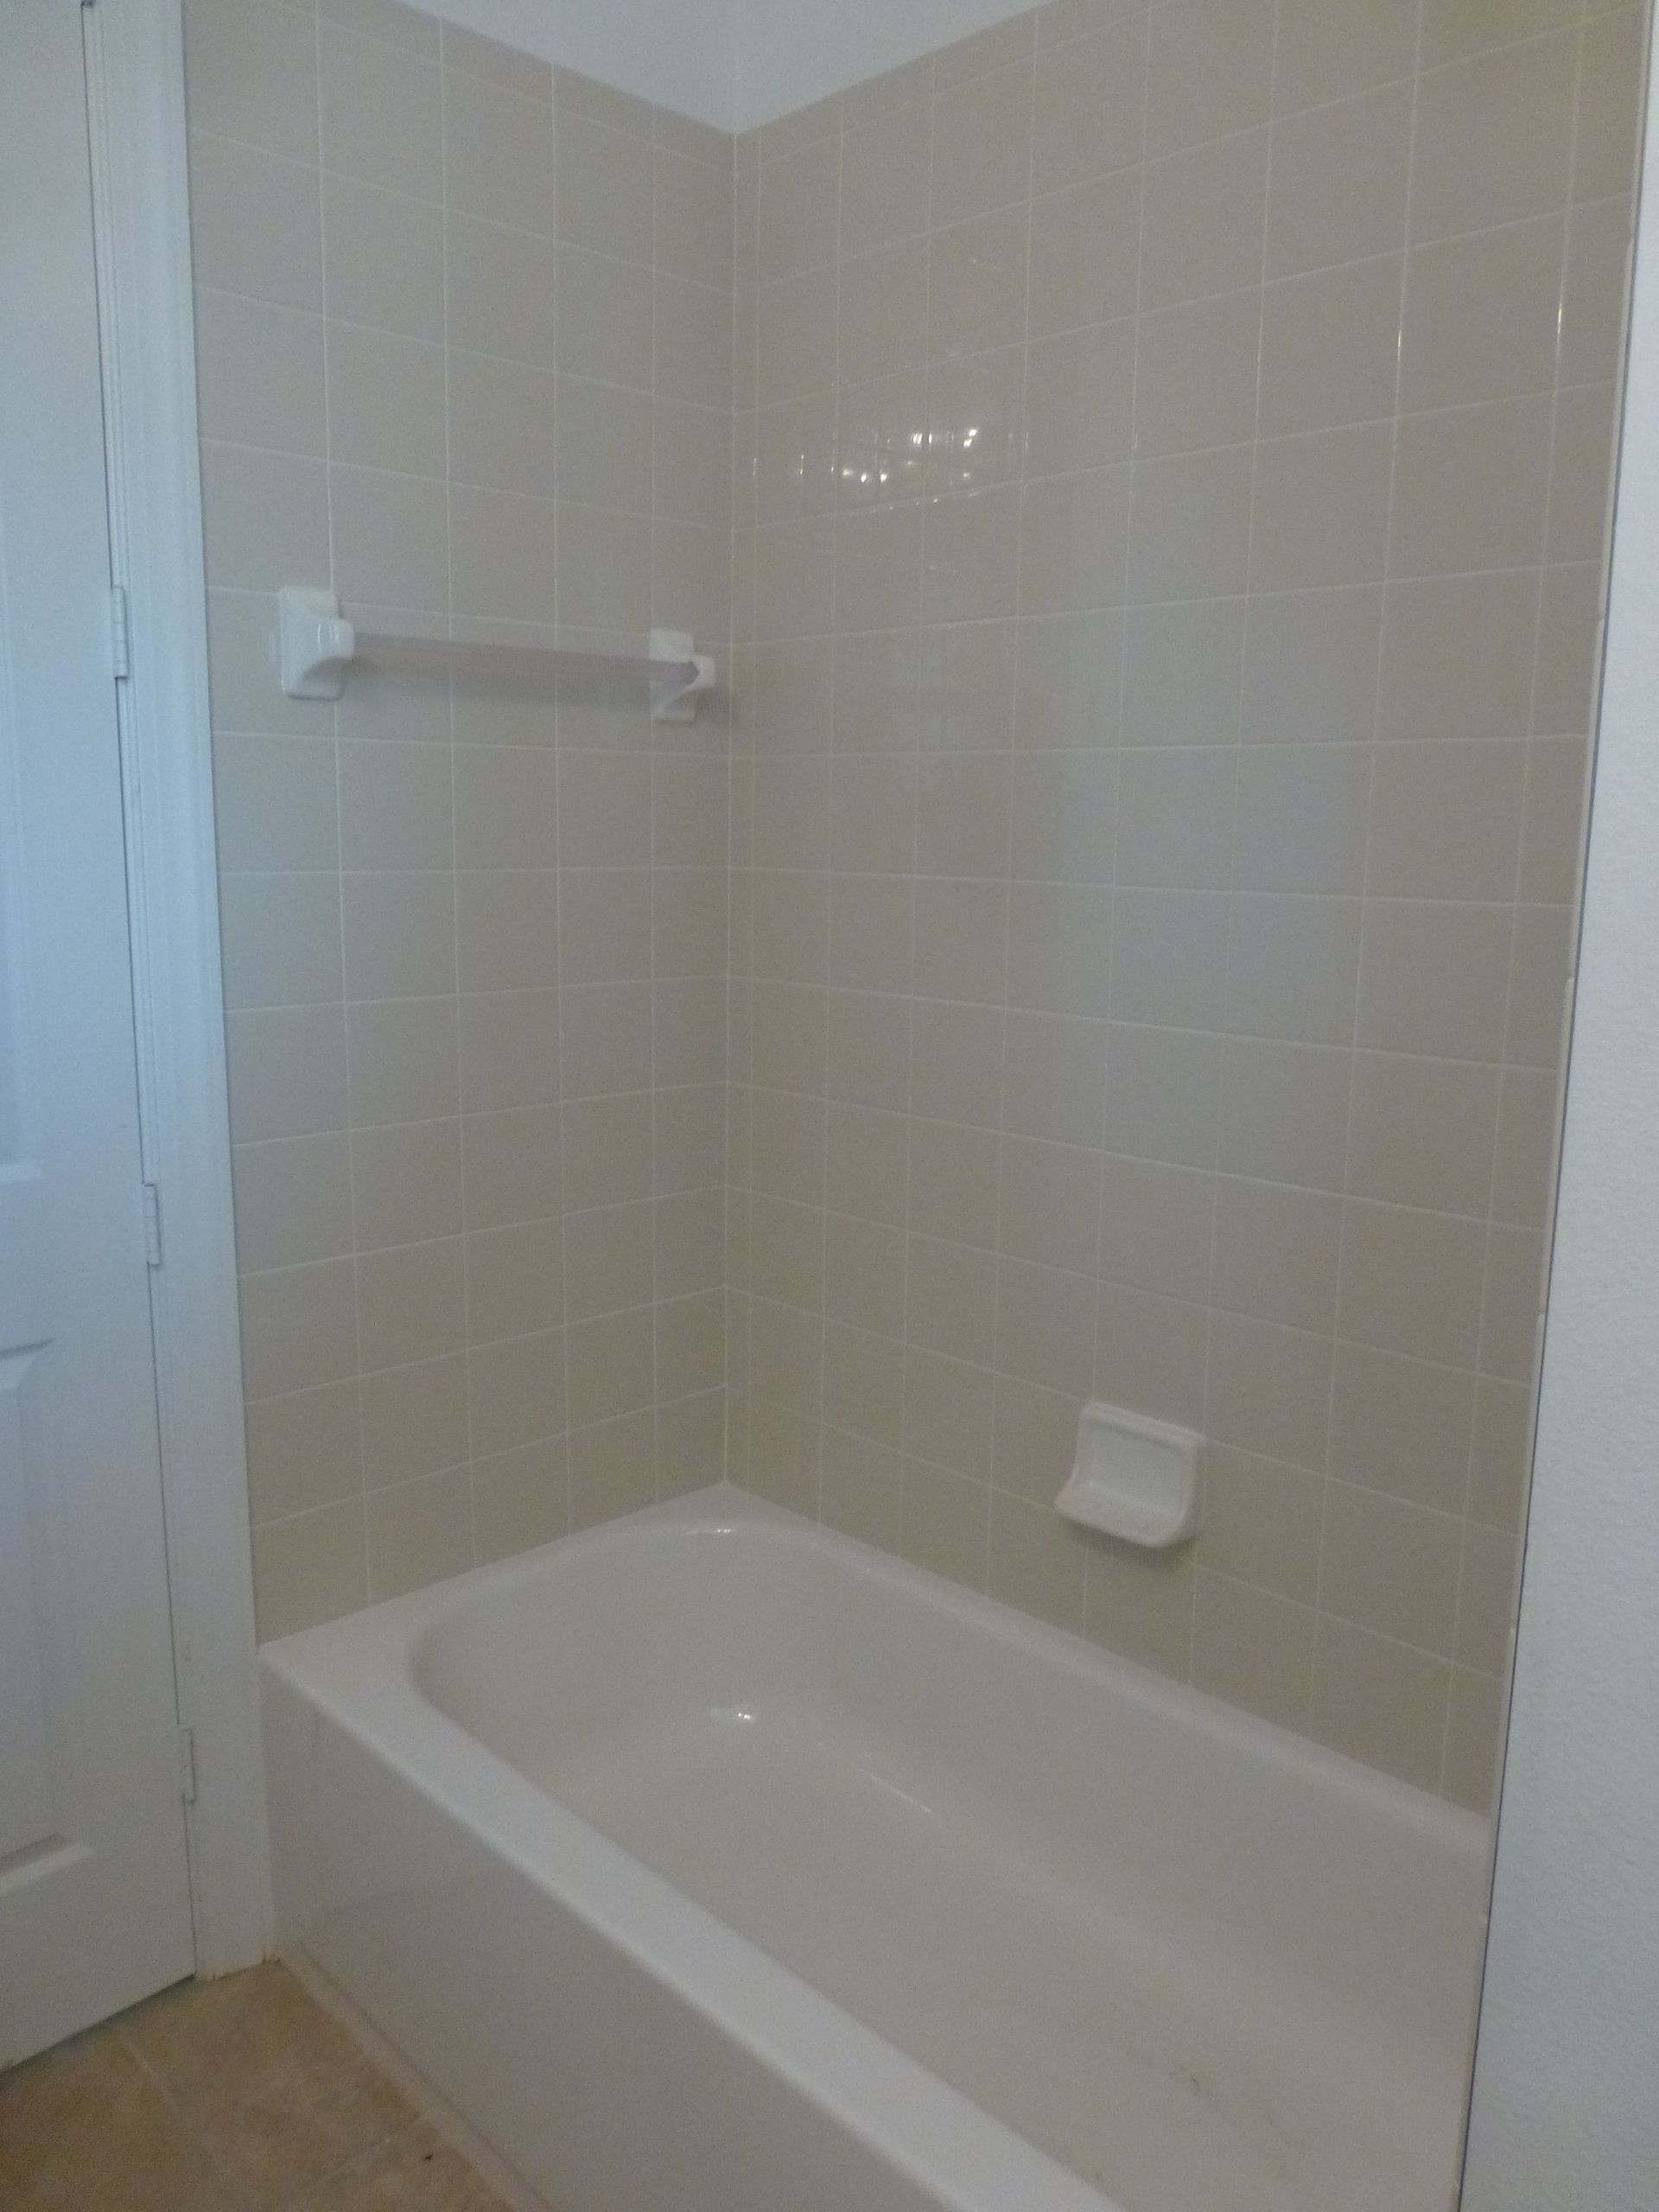 6x6 bone bath wall tile with white